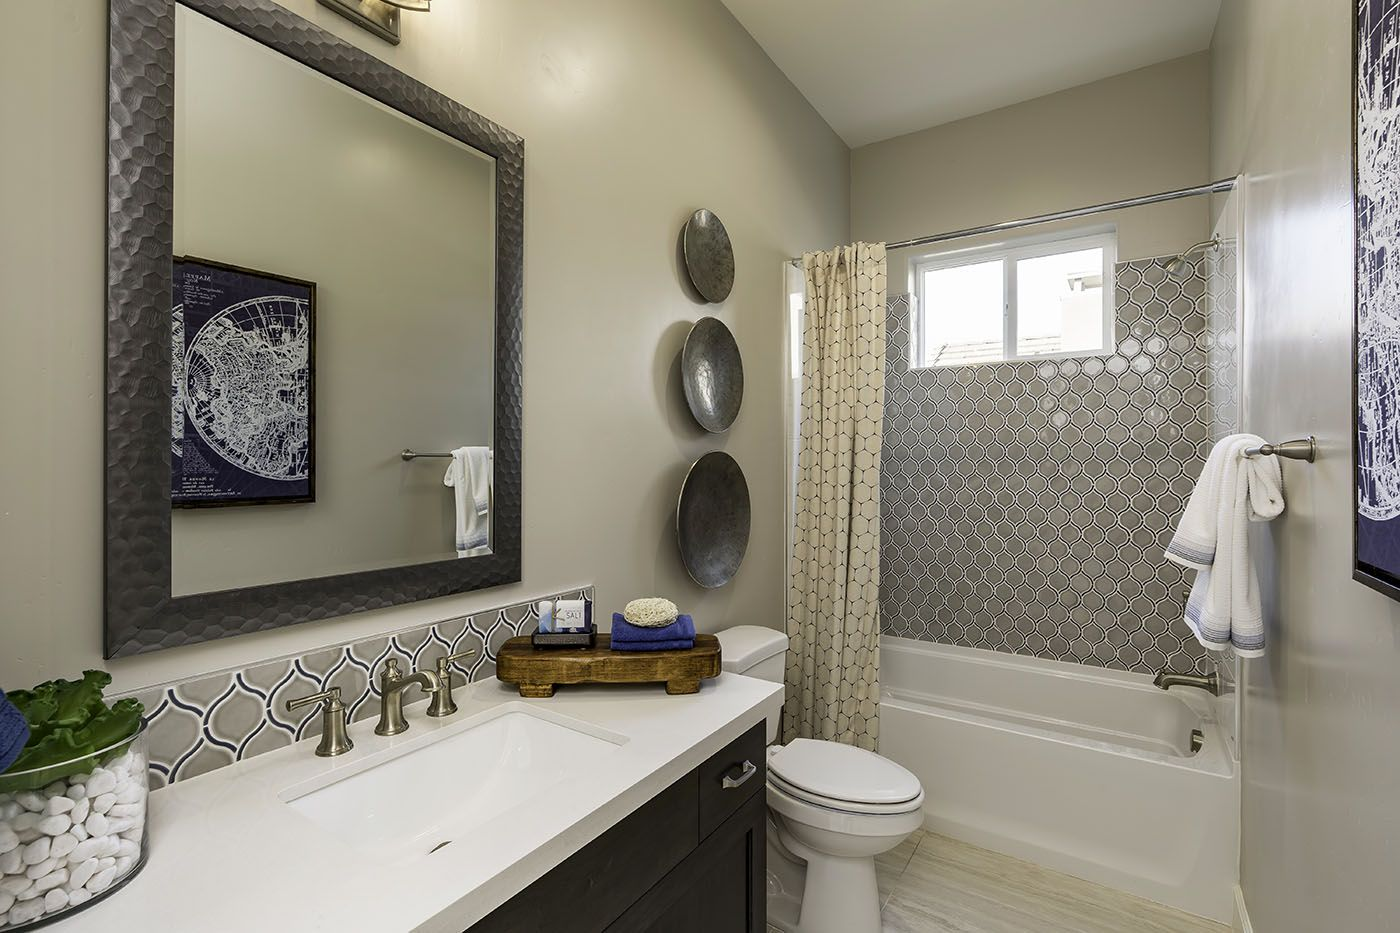 Bathroom featured in the Windsor By Coastal Community Builders in Santa Barbara, CA